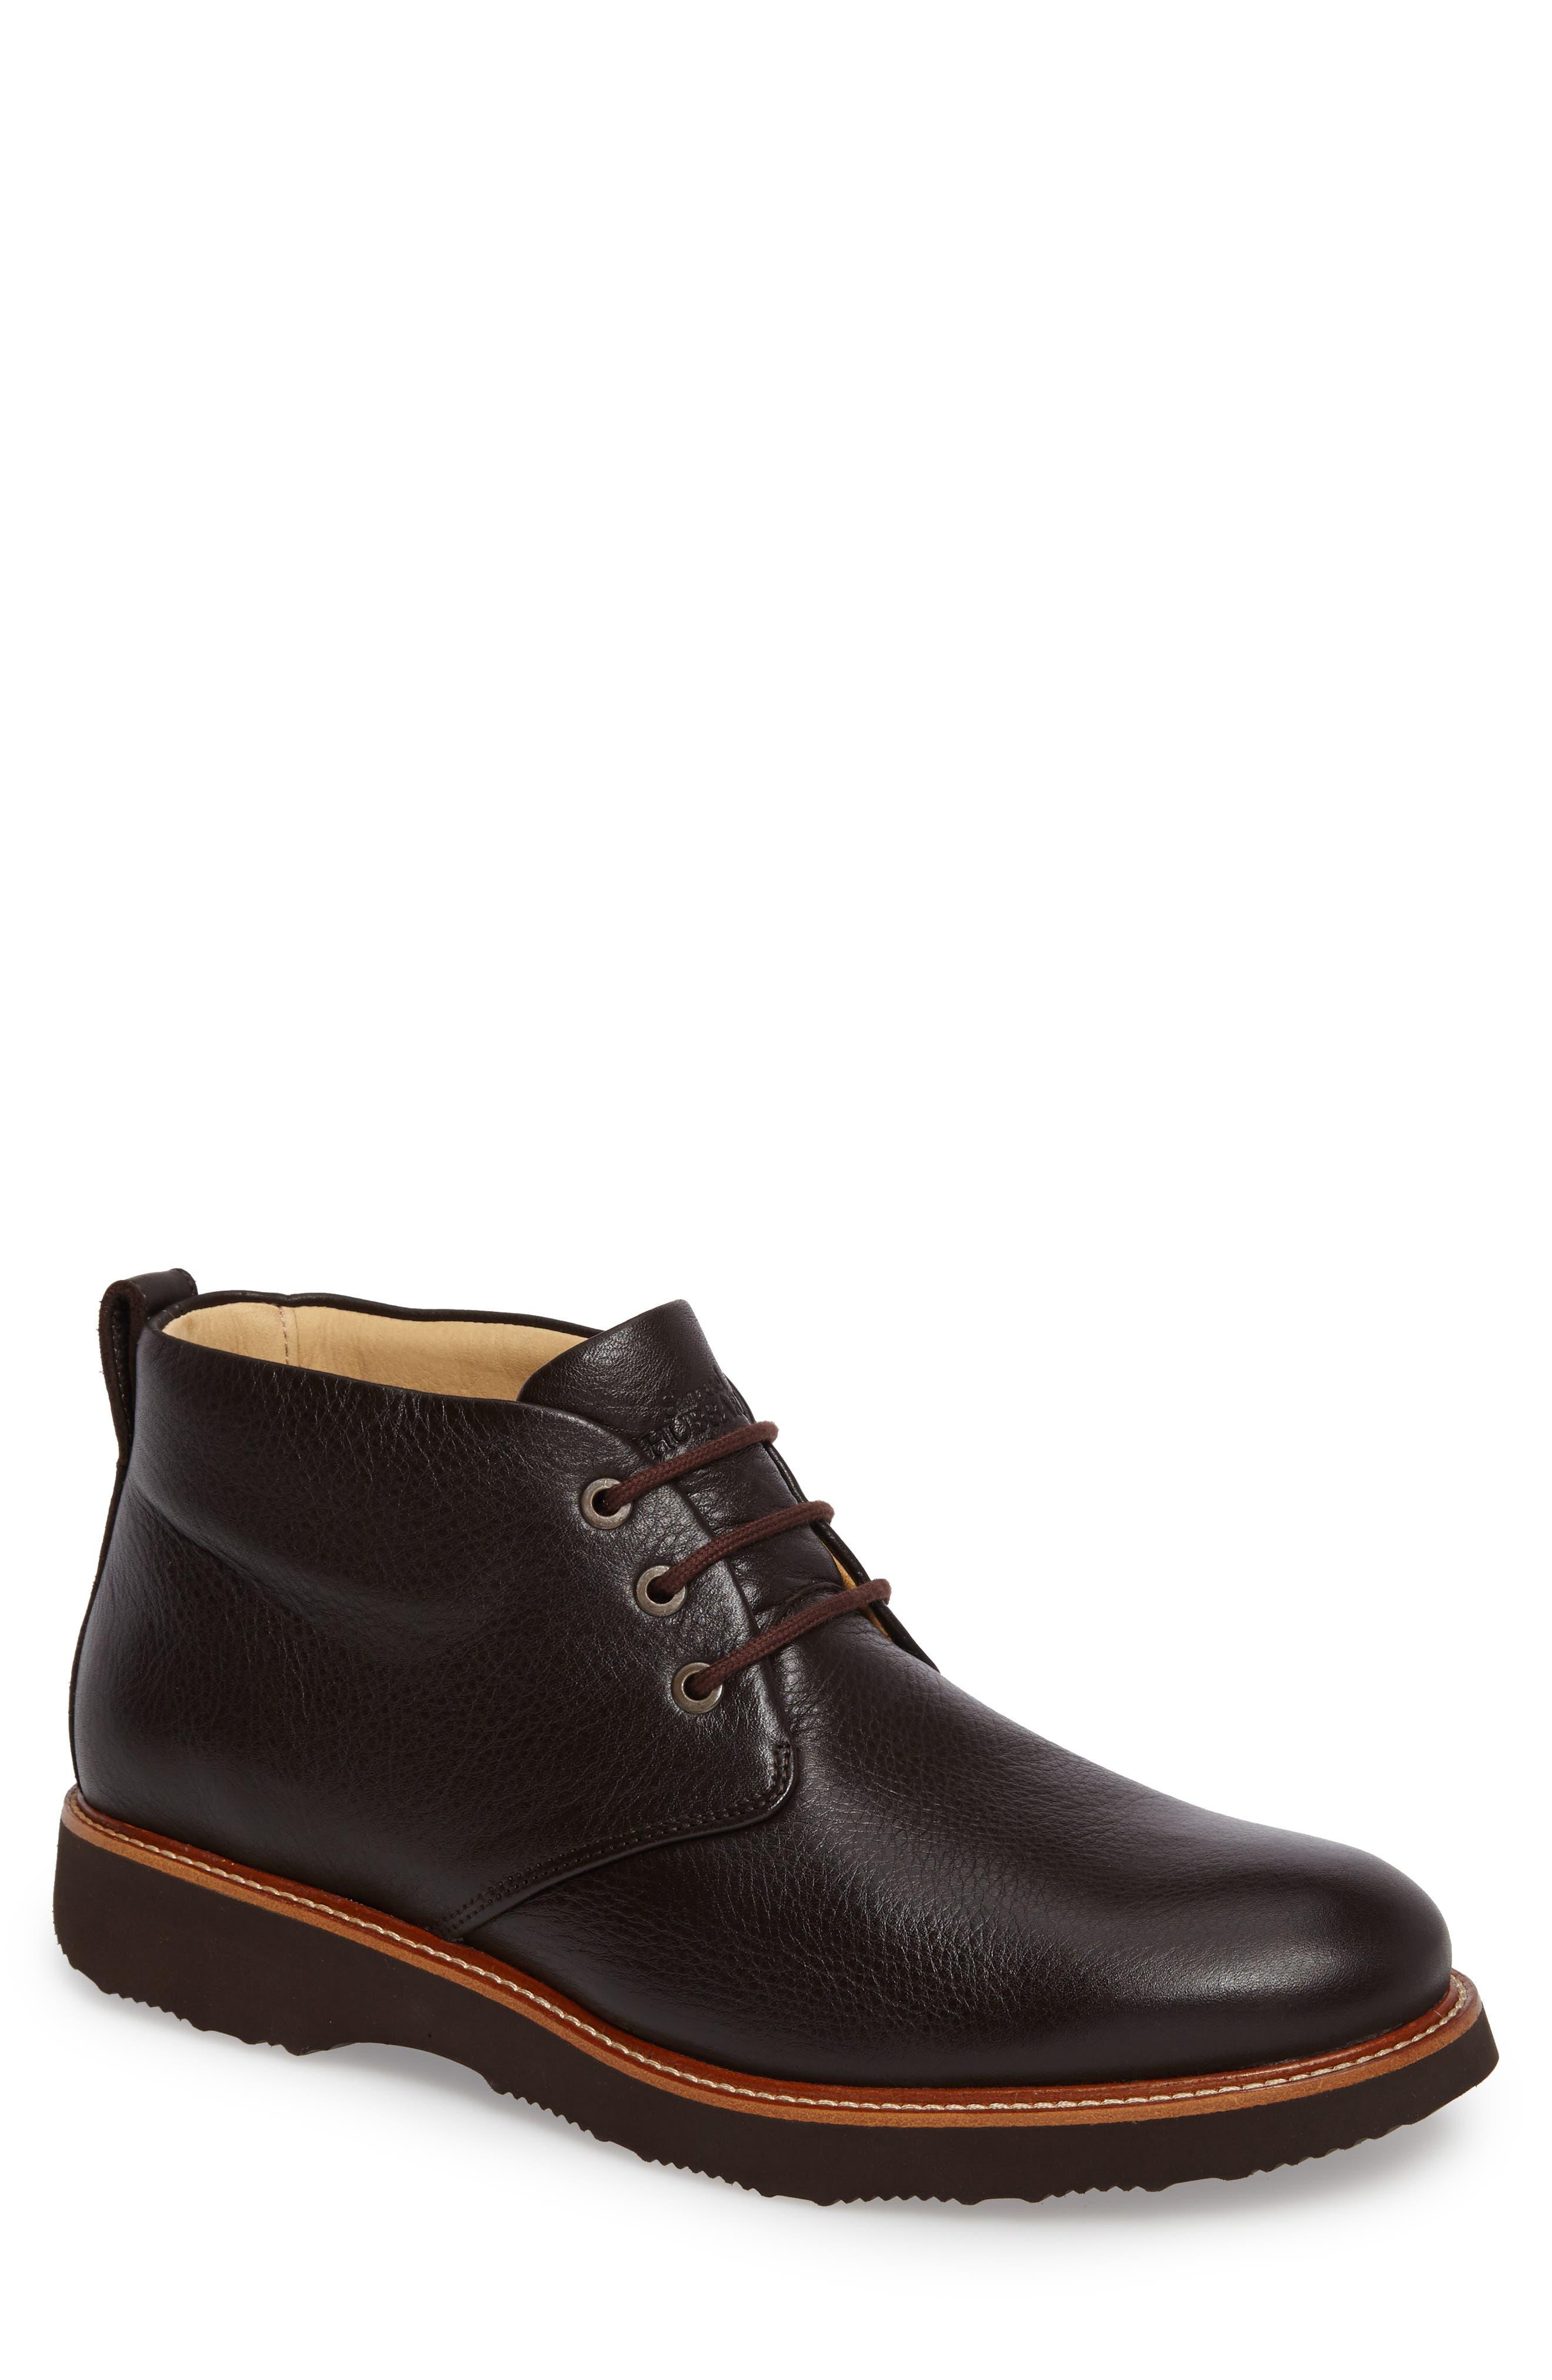 Samuel Hubbard Re-Boot Chukka Boot, Brown